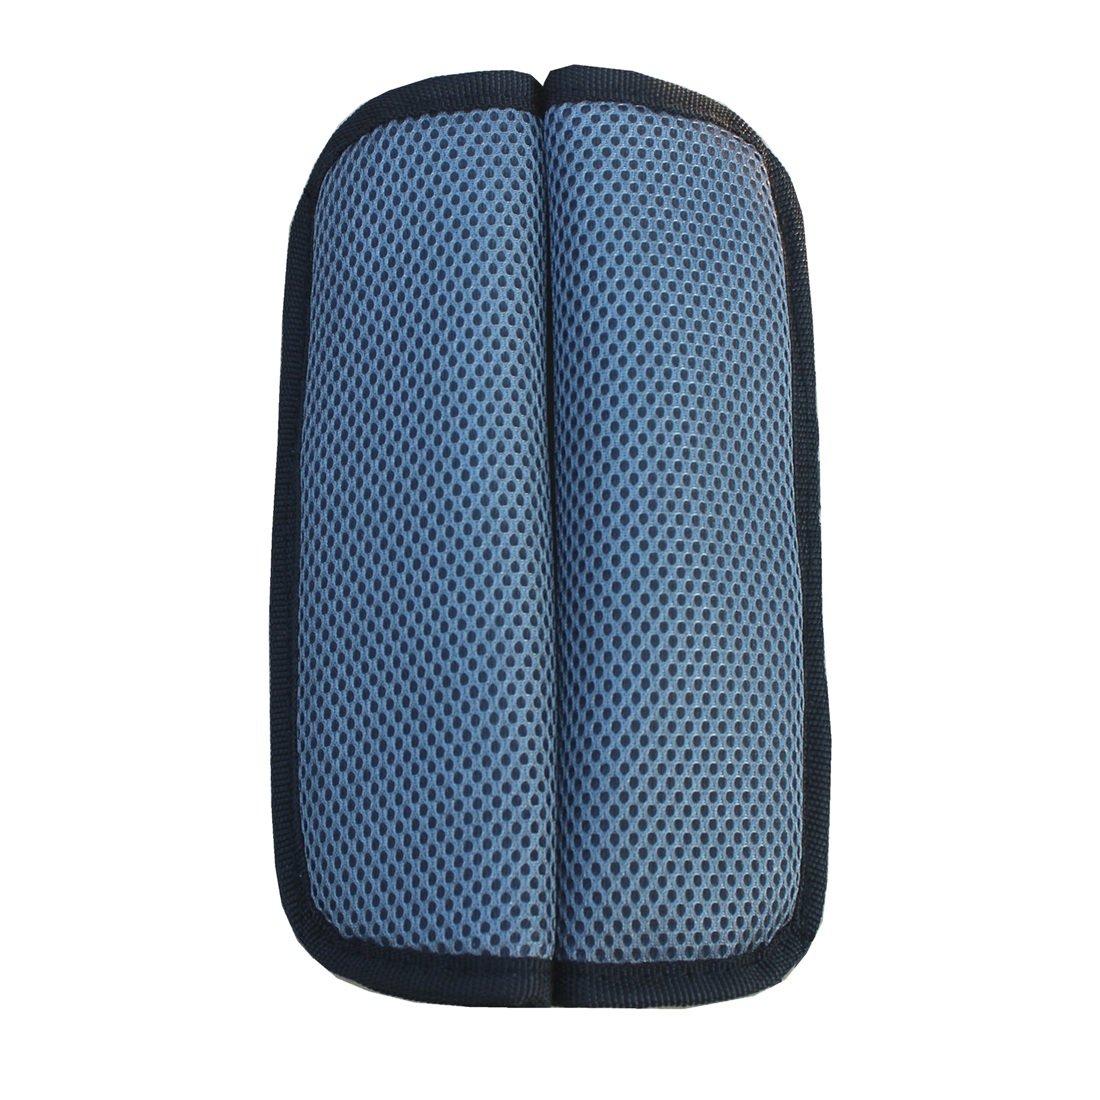 Milong Almohada del Cinturón|Almohadillas para Cinturón| Almohada Cojín de Hombro| Unisex para Proteger Hombro de Bebés Niños para Coche Cochecito Silla de Paseo Azul